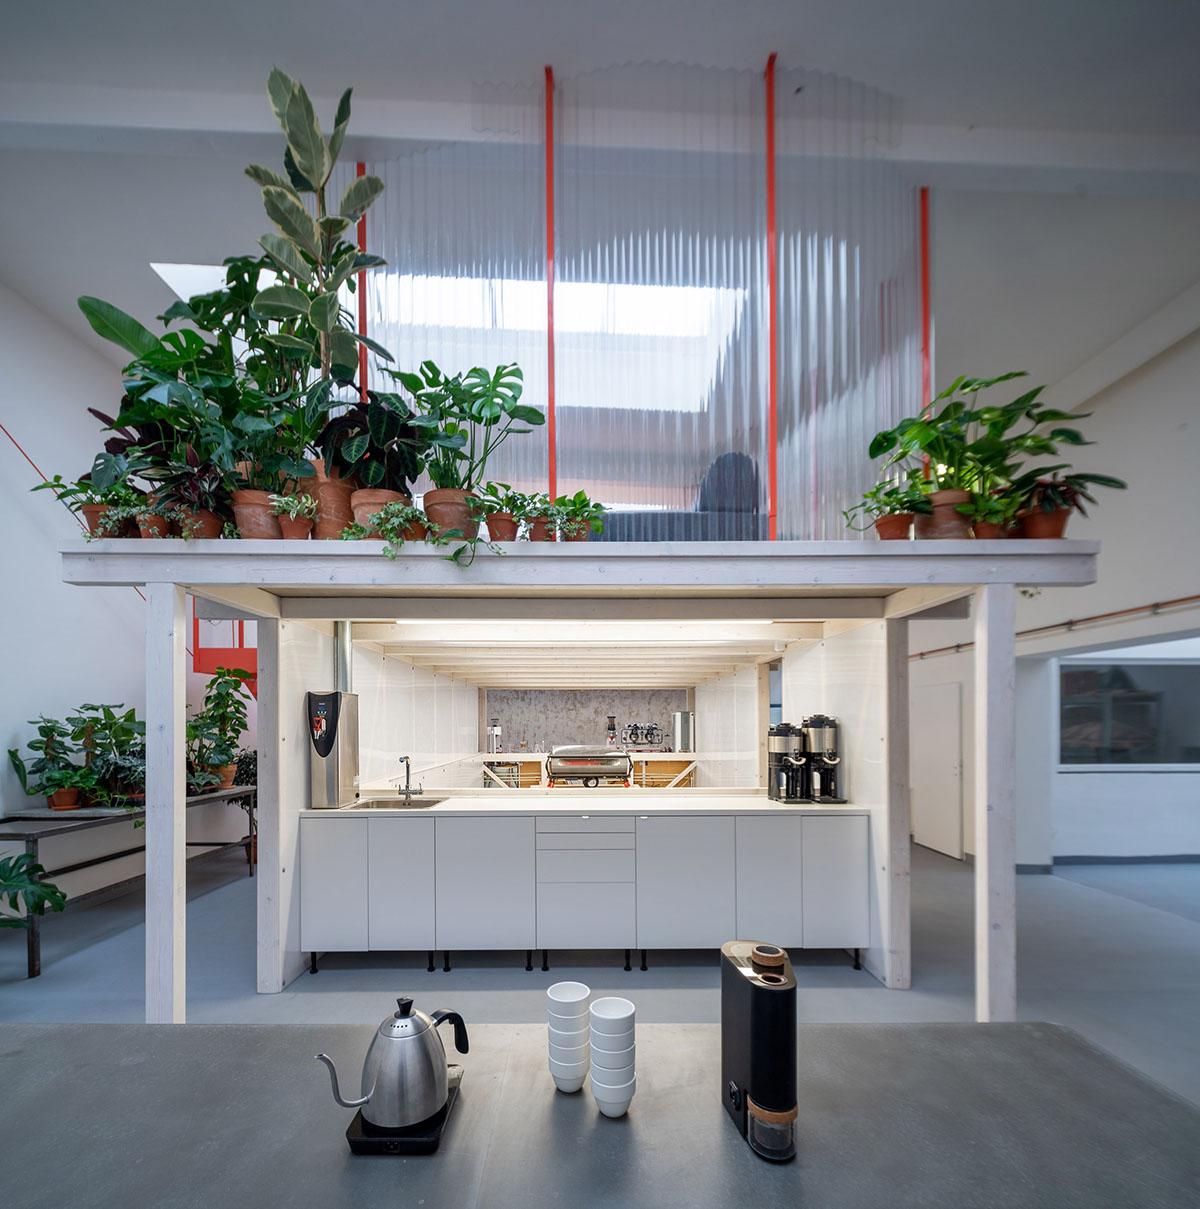 Grounds-Coffee-Hub-Kogaa-Alex-Shoots-Buildings-07